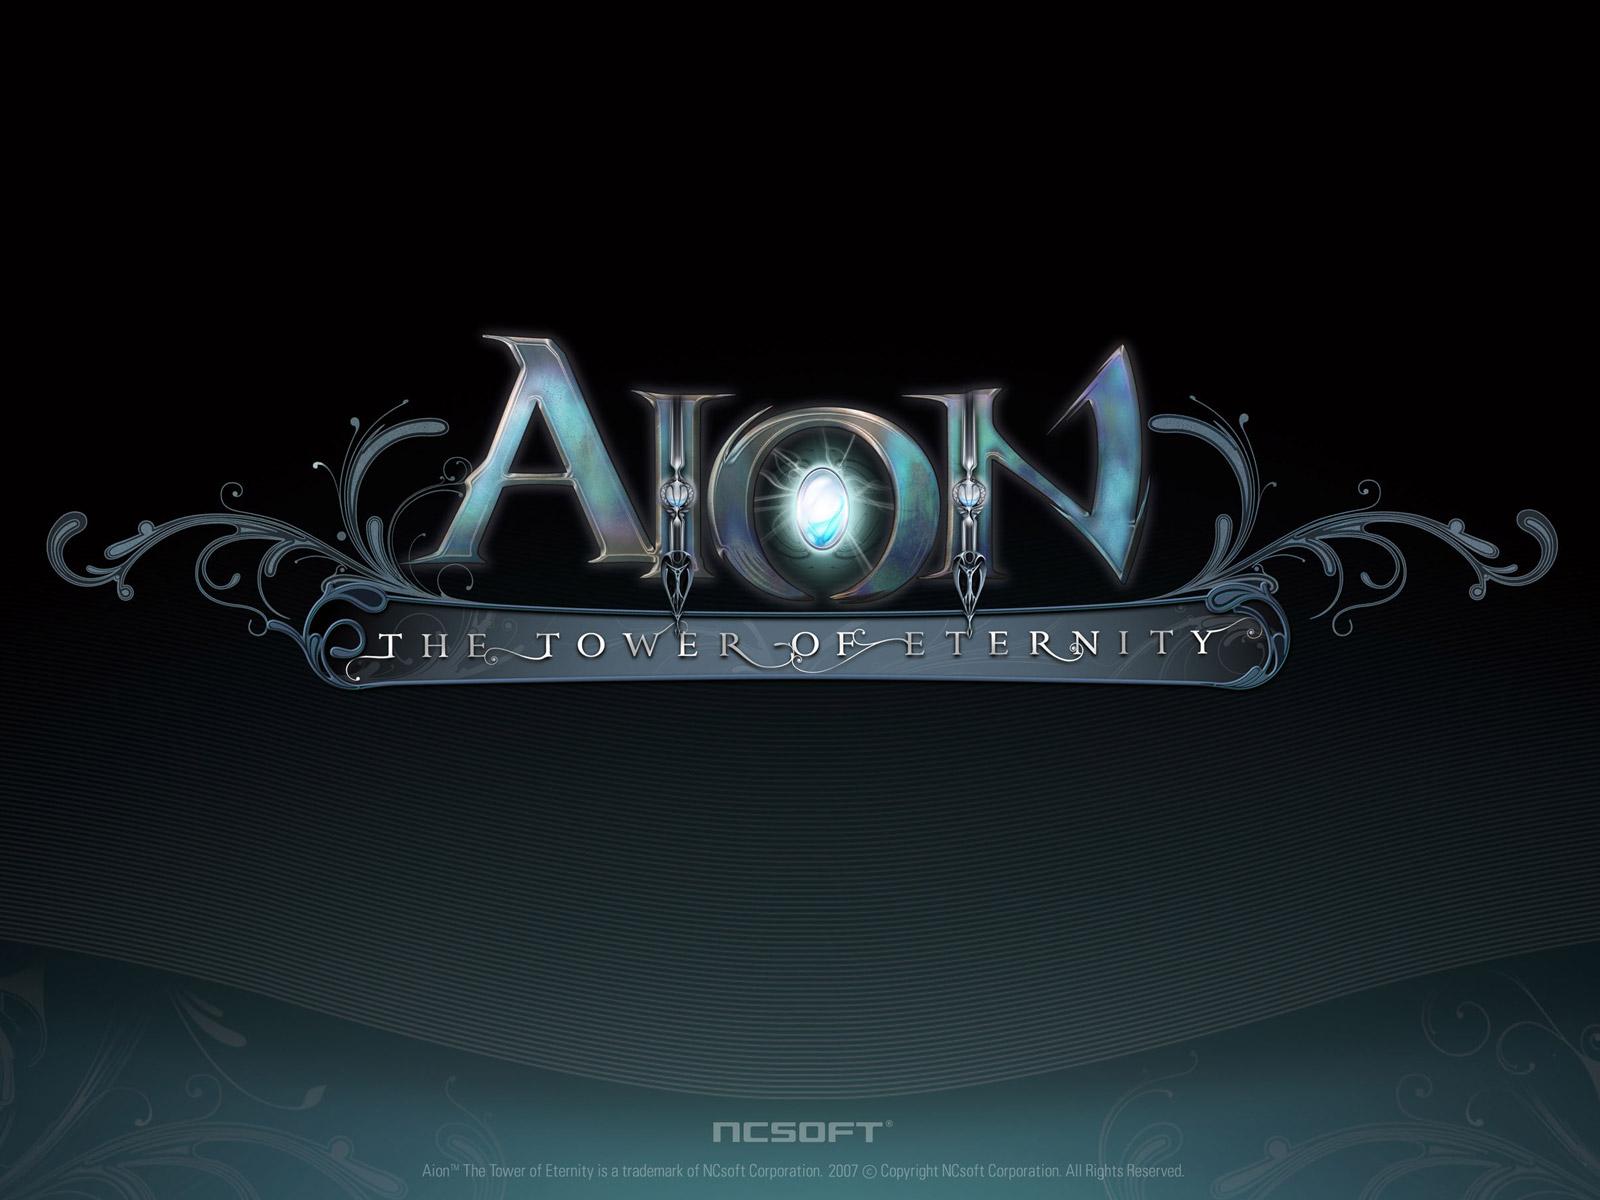 http://4.bp.blogspot.com/-4i19N5cOieA/Tf9AkCe86oI/AAAAAAAABUA/ecPyGcst4Xo/s1600/Aion+aion-logo.jpg